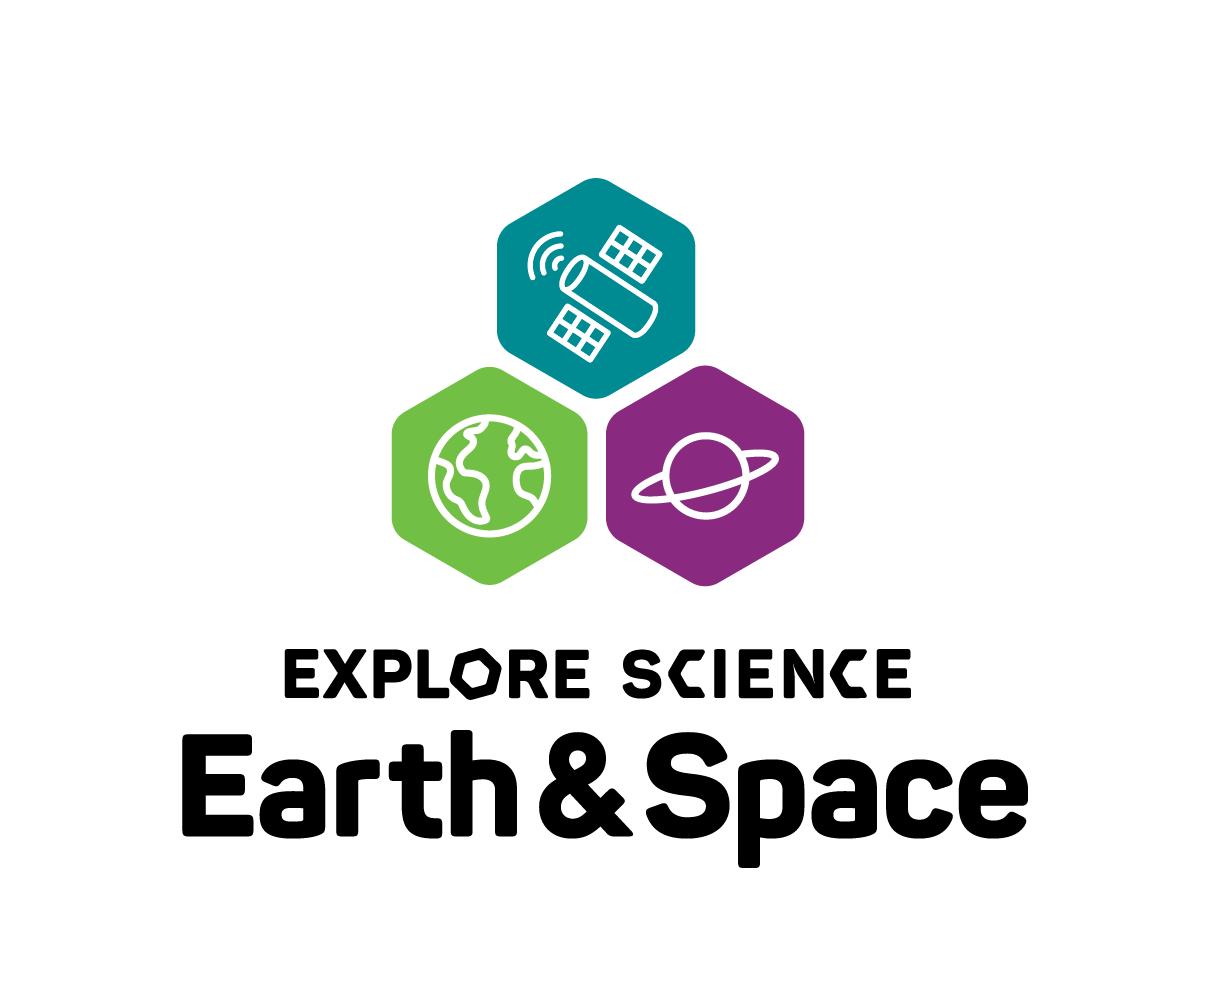 Earth & Space logo